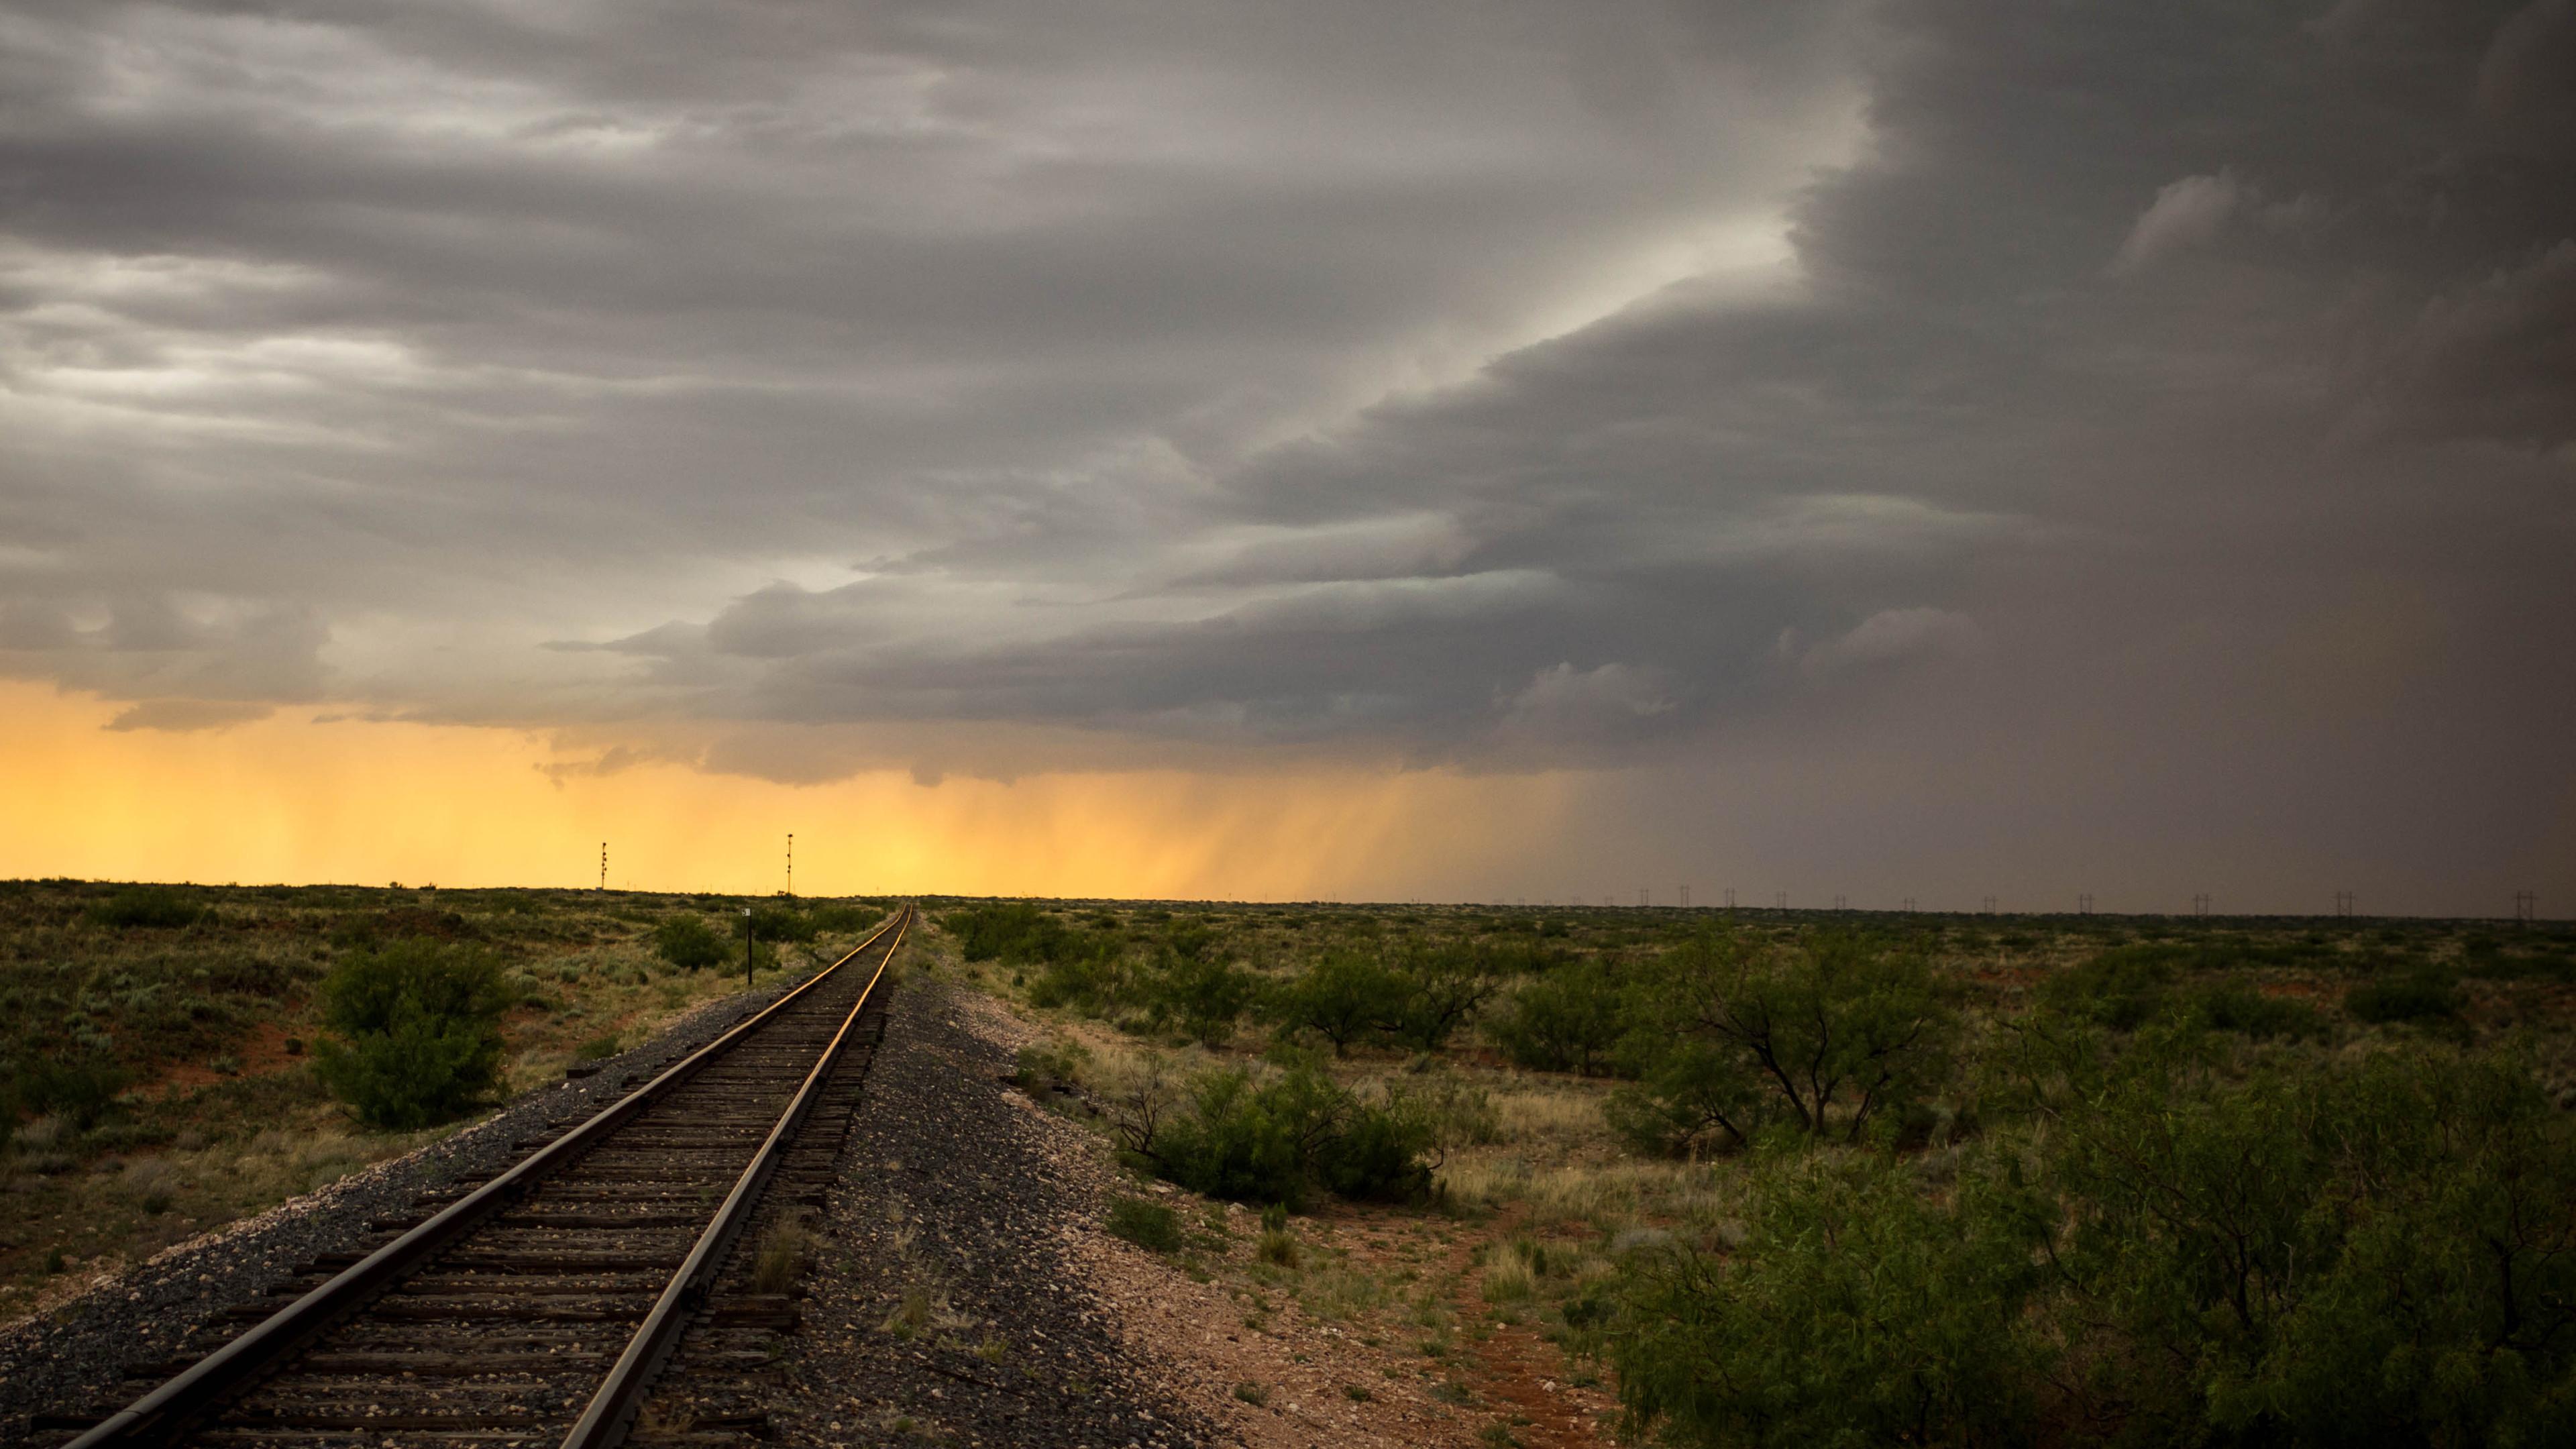 BOTPOST] A Stormy Evening in SE New Mexico [3840x2160] iimgurcom 3840x2160